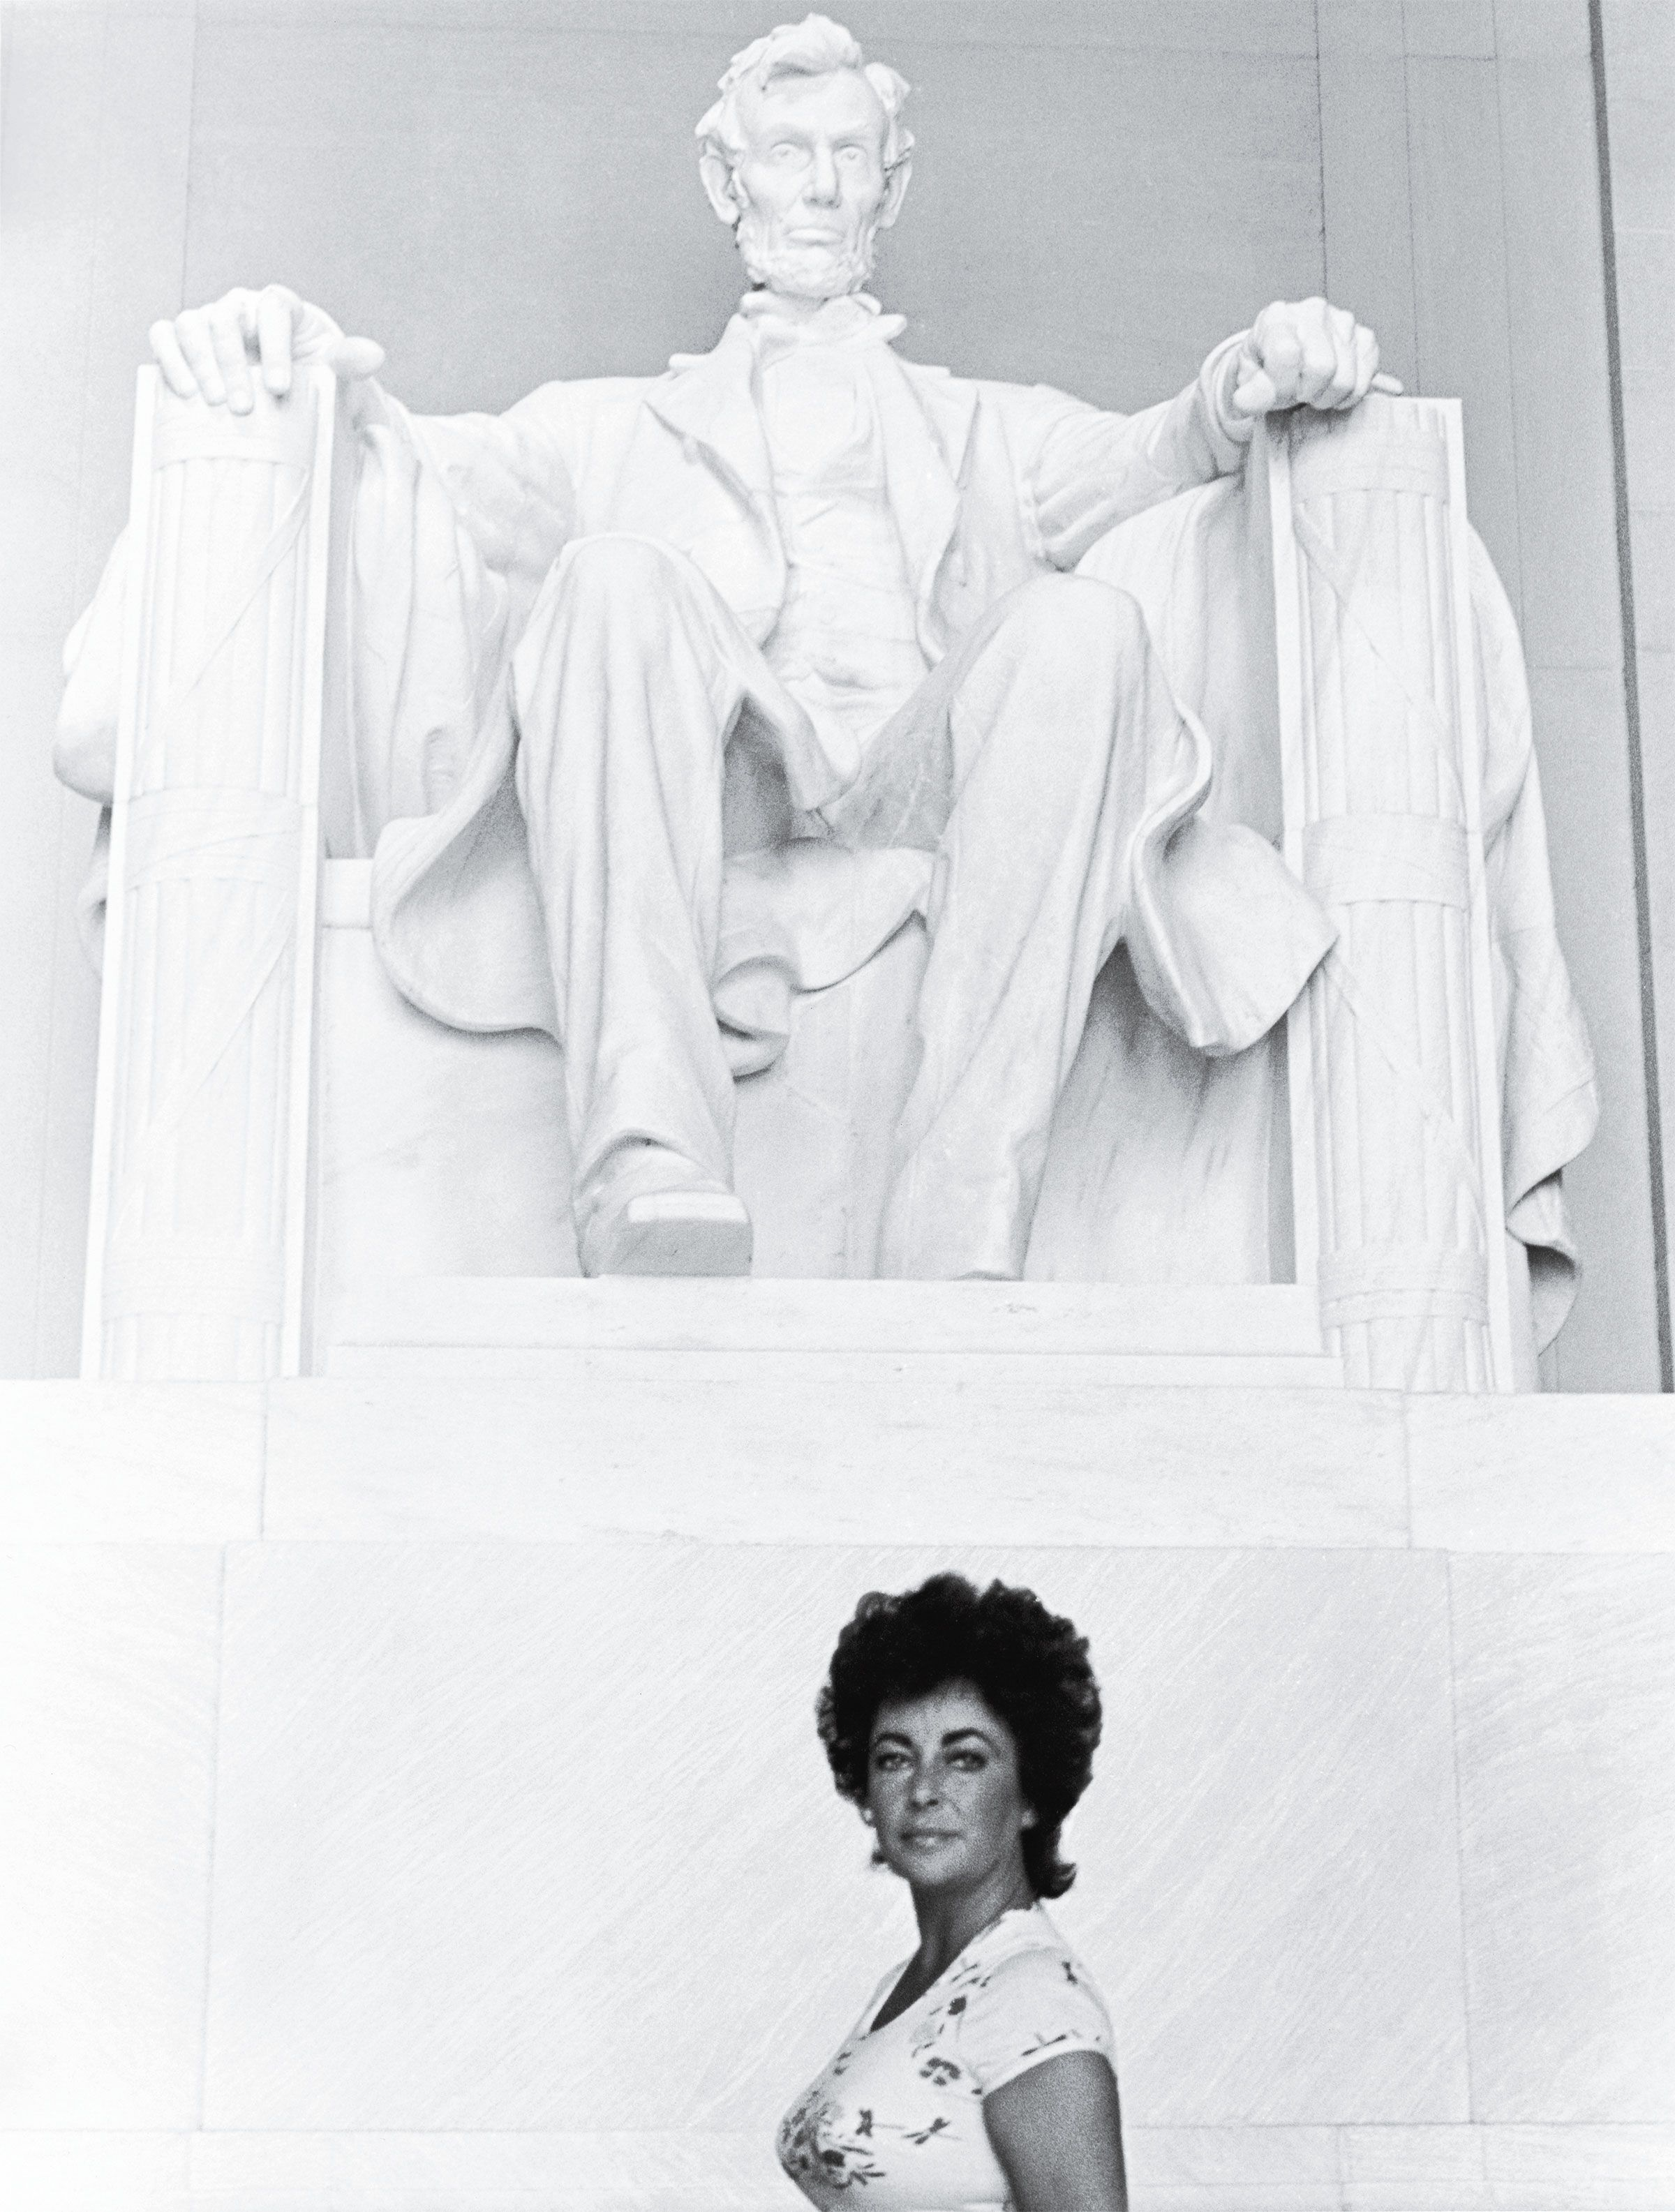 Elizabeth Taylor at the Lincoln Memorial in 1976.